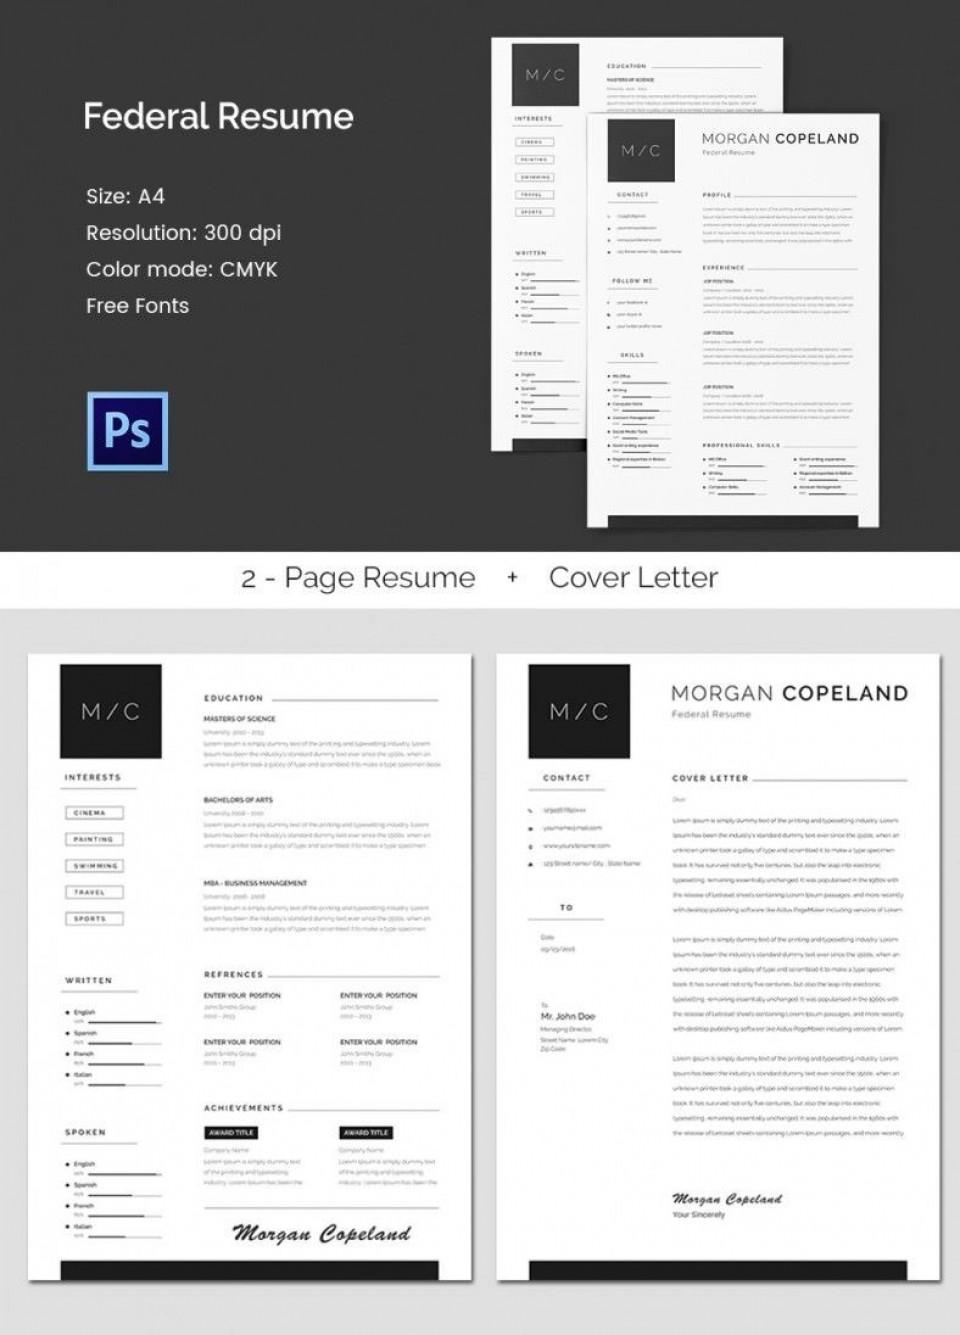 007 Fantastic Software Engineering Resume Template Highest Clarity  Engineer Microsoft Word Cv Free Developer Download960